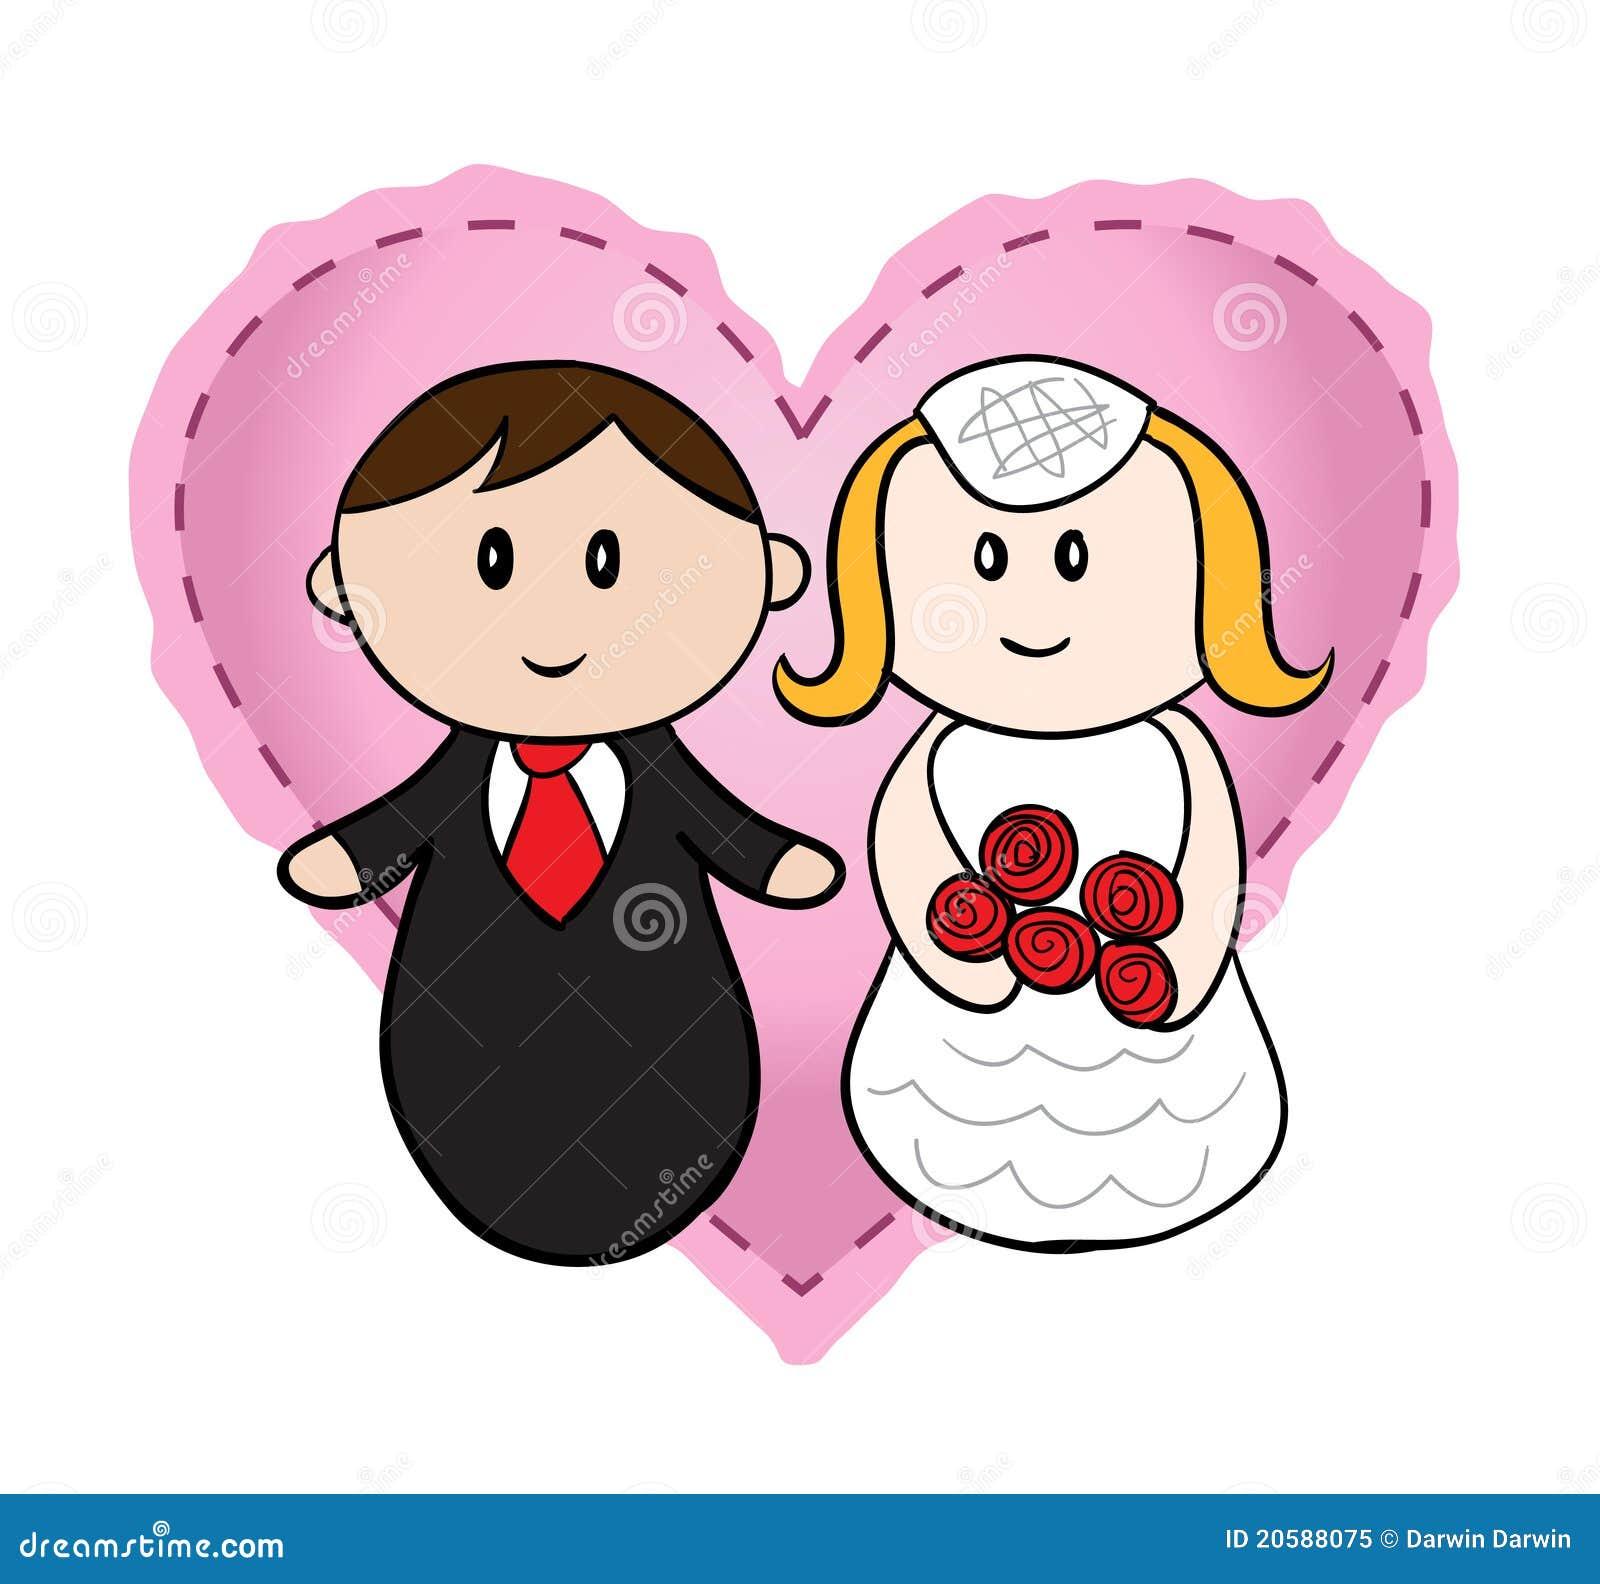 Wedding Cartoon stock vector. Illustration of people - 20588075